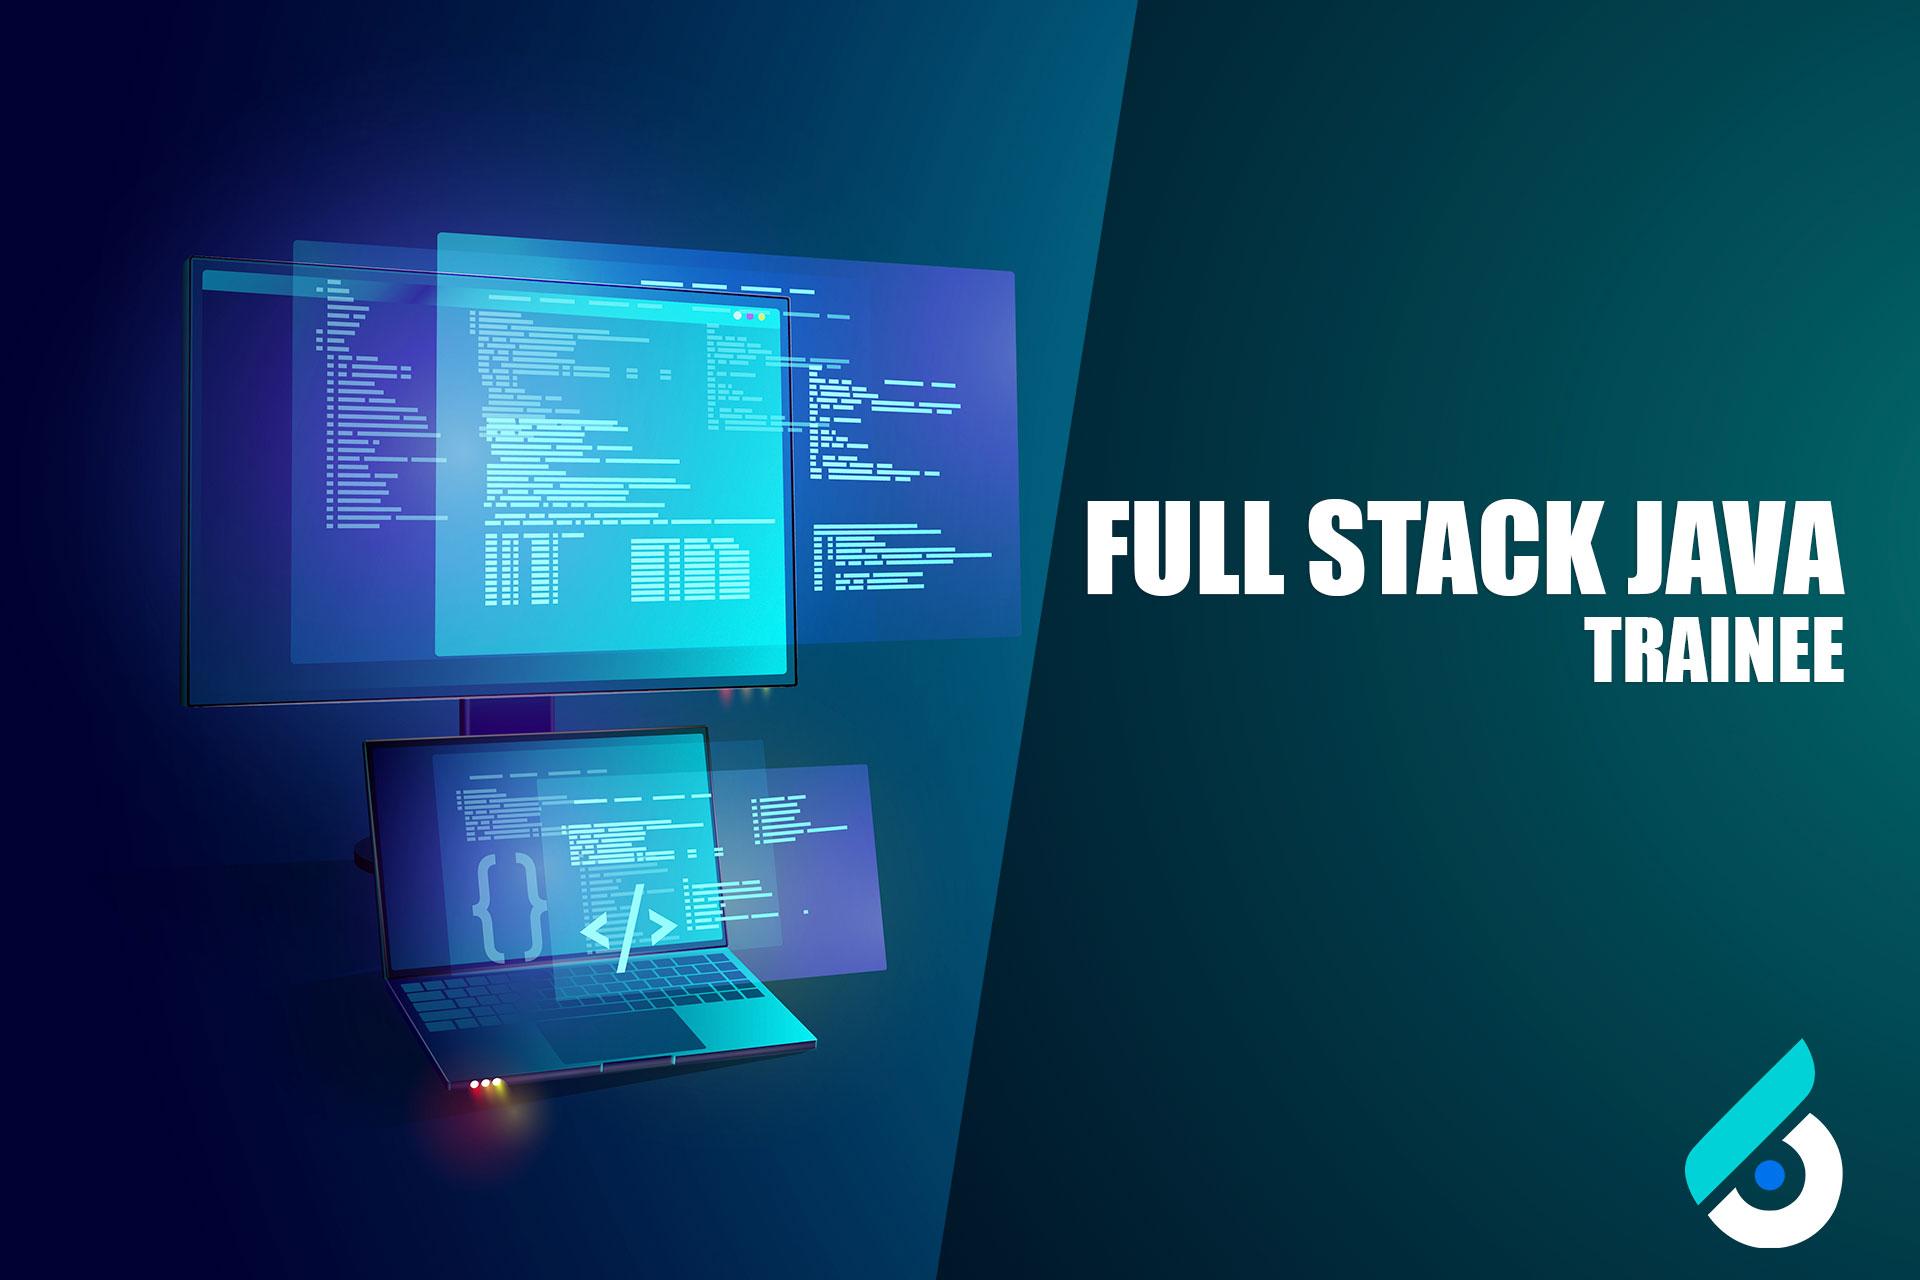 RLAB-20-01-05-0155-1 | Desarrollo de Aplicaciones Full Stack Java Trainee